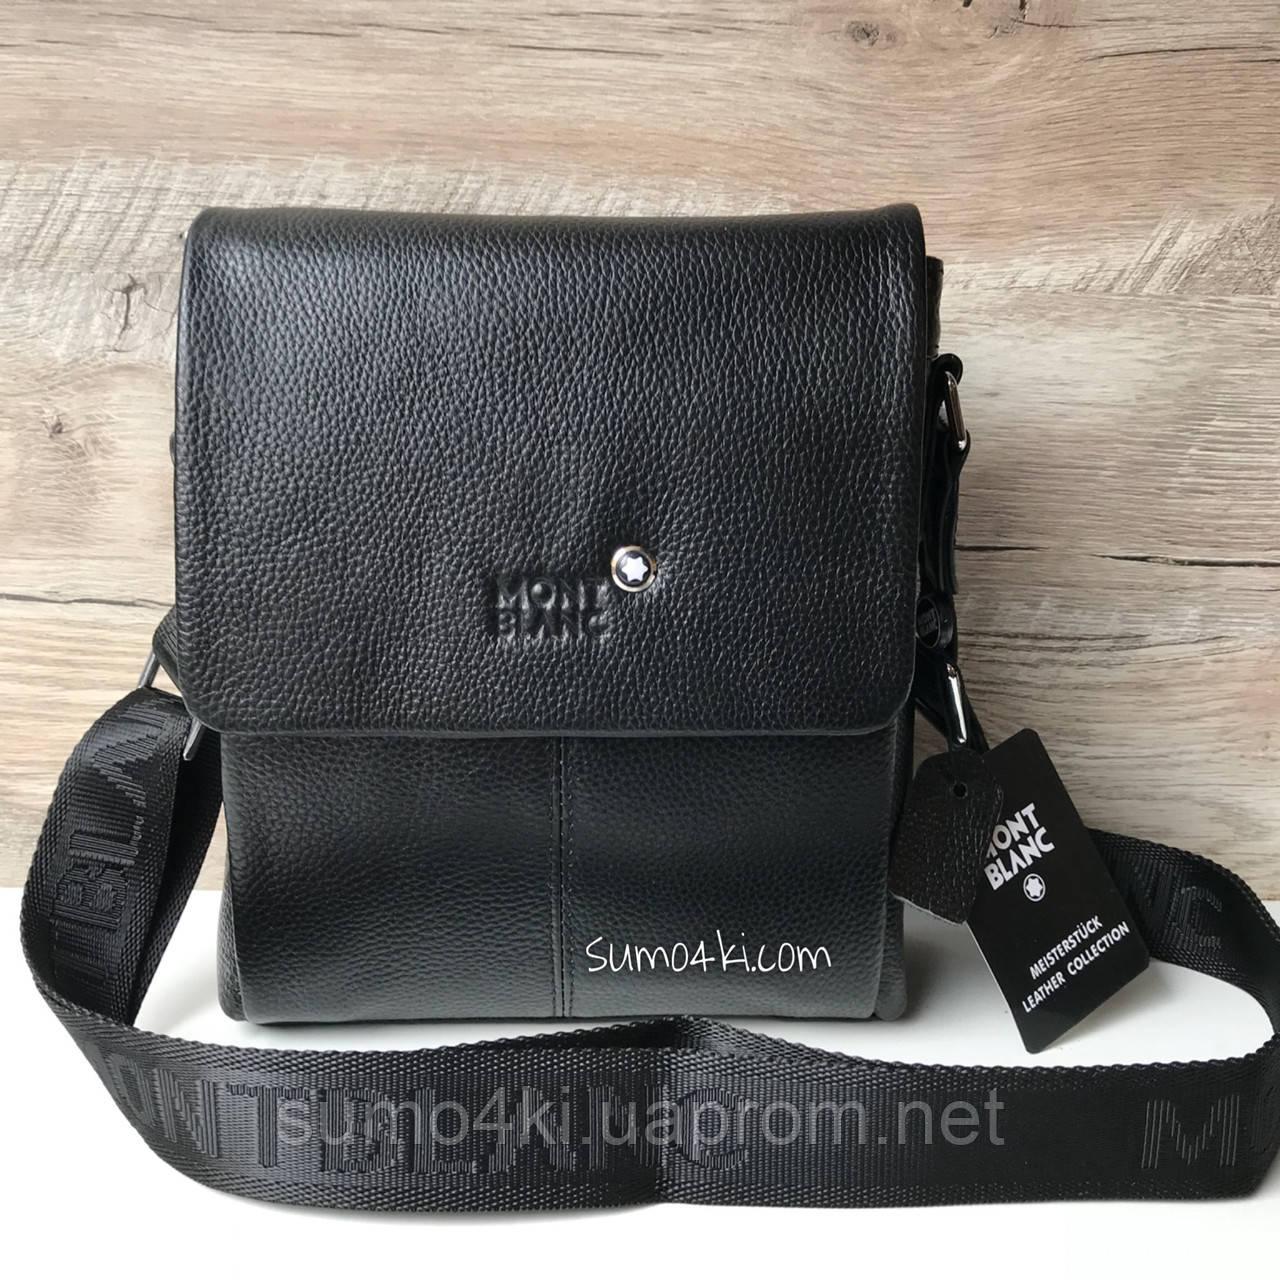 d235d35bde13 Мужская кожаная сумка через плечо Mont Blanc - Интернет-магазин «Галерея  Сумок» в